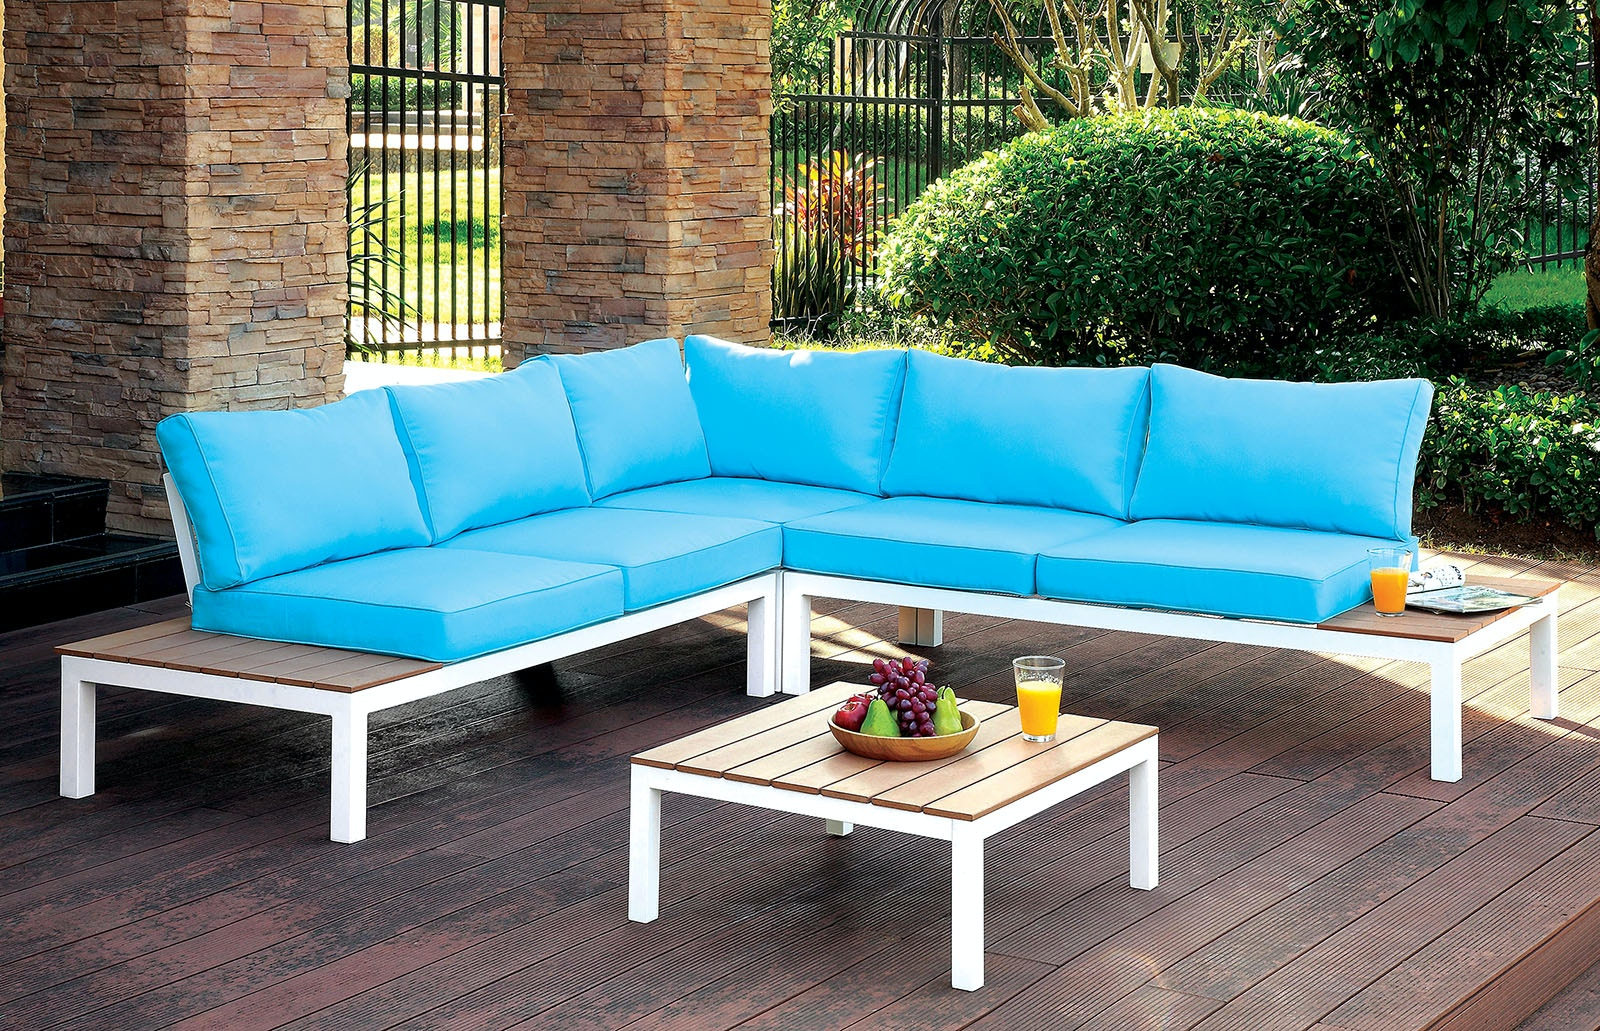 Incroyable Furniture Of America Corner Chair + Ottoman CM OS2580 2